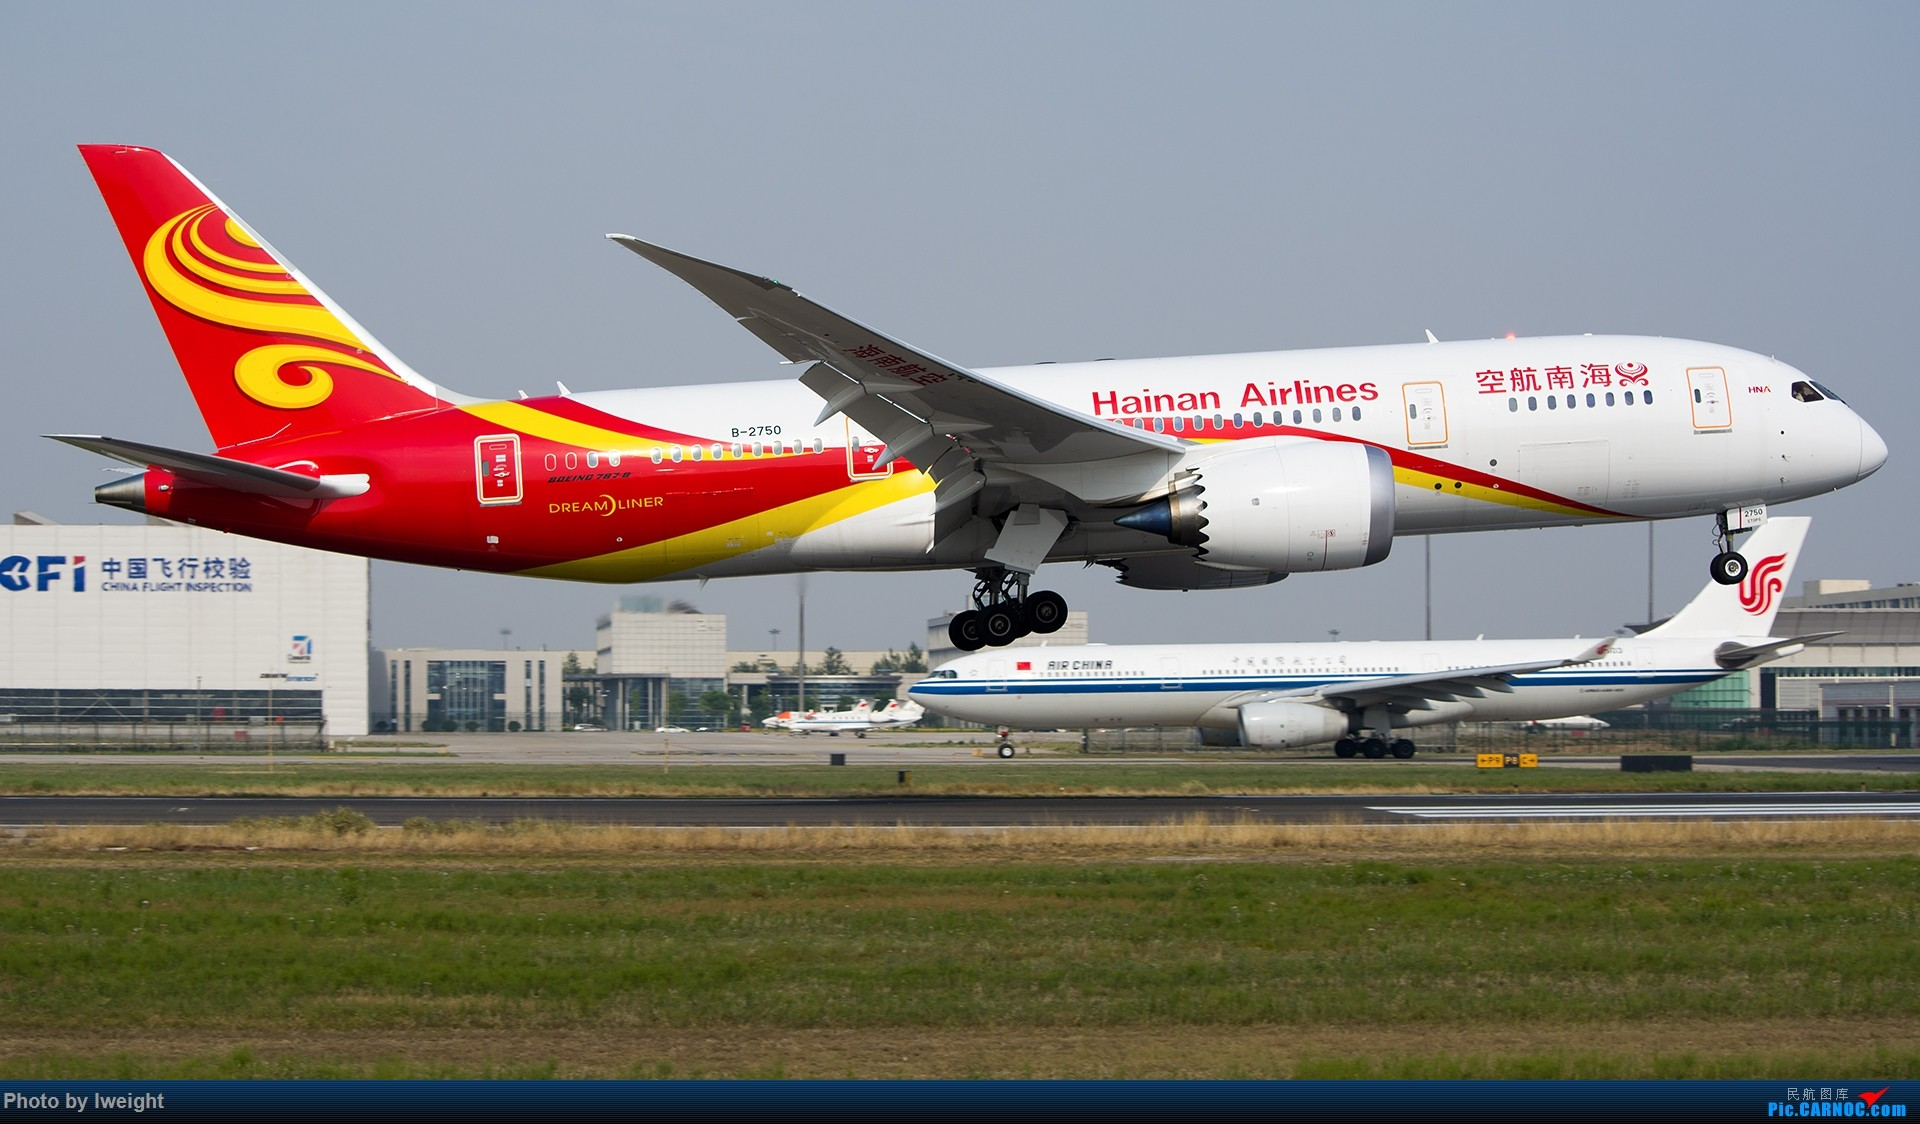 Re:[原创]周末帝都霾天拍机,凑合看看吧【2015-5-23】 BOEING 787-8 B-2750 中国北京首都国际机场